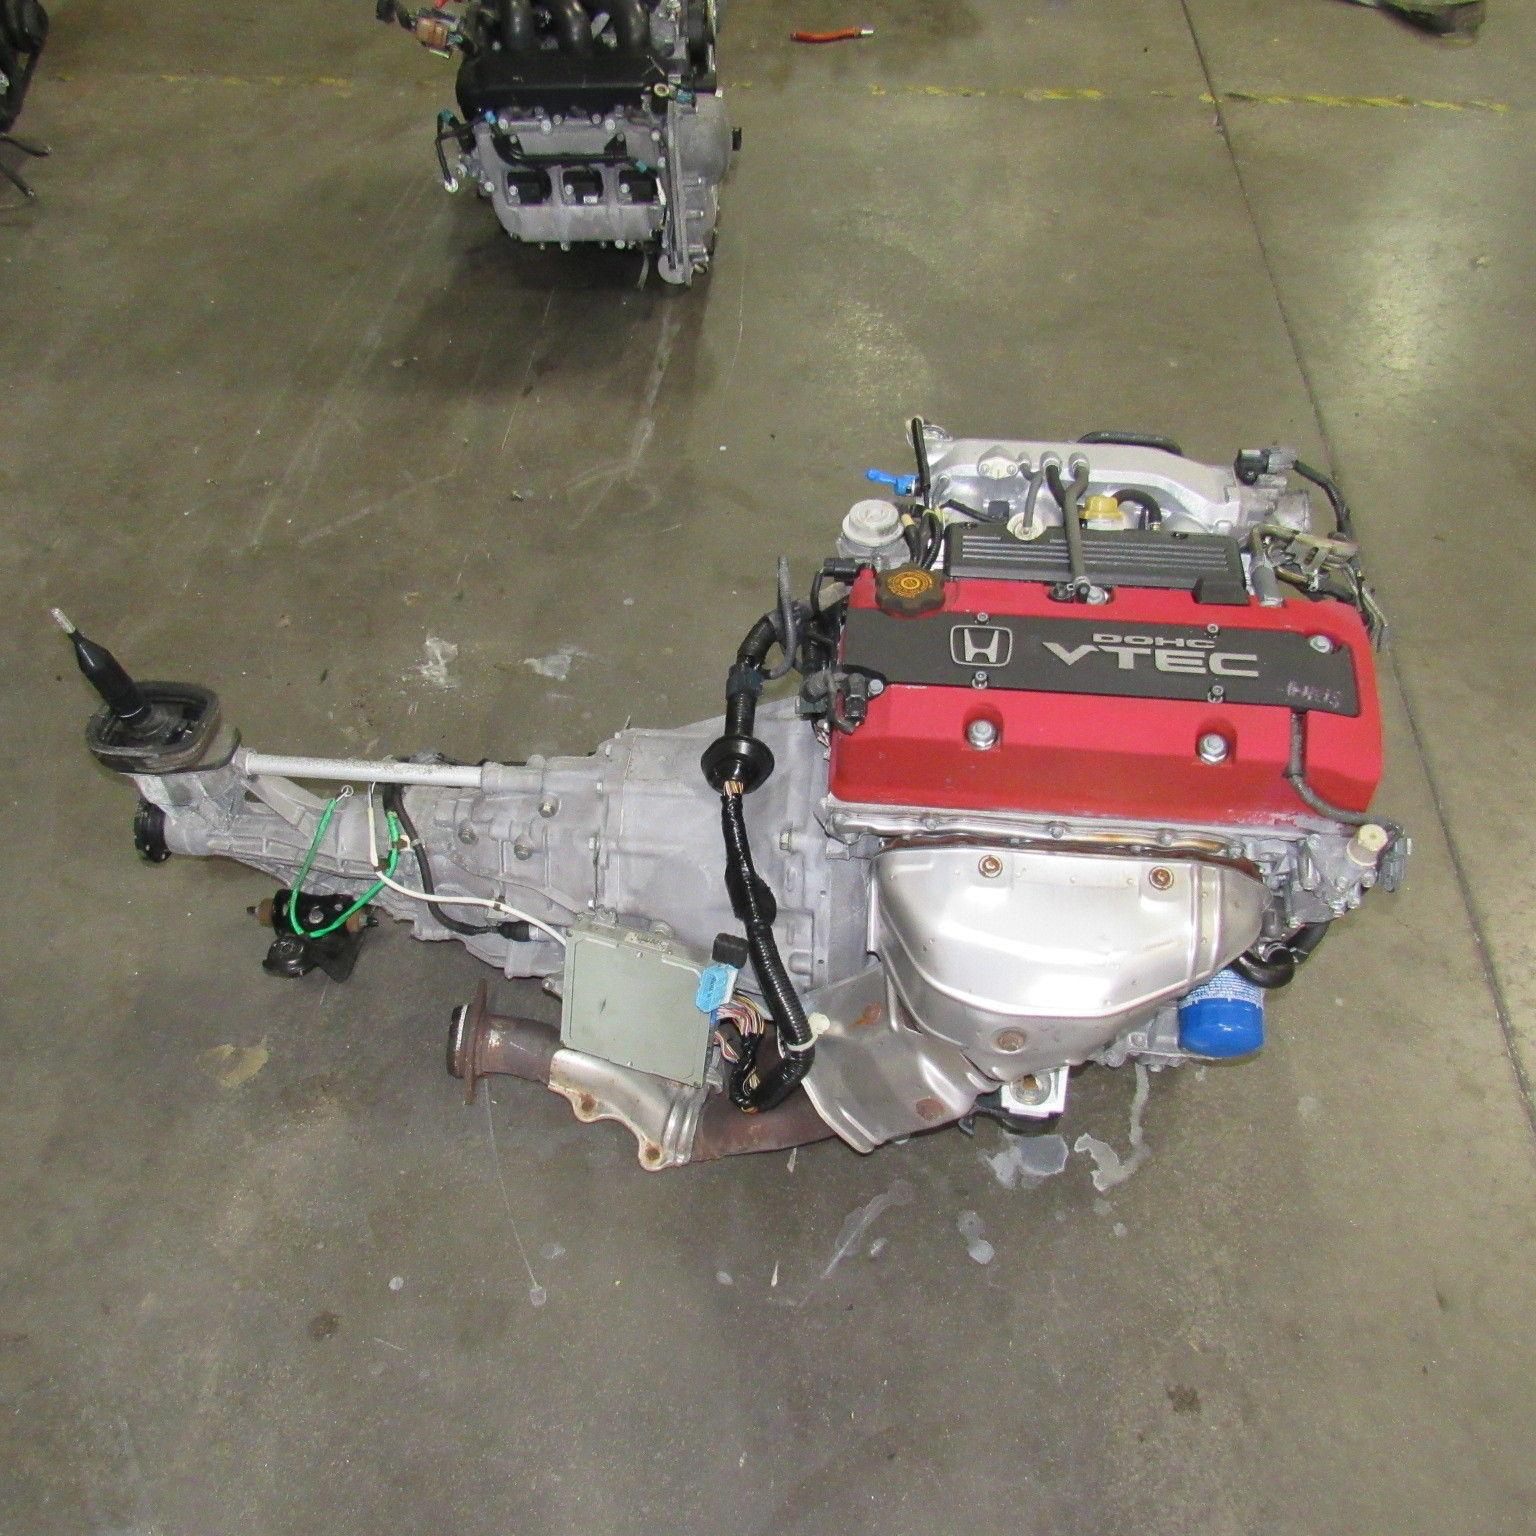 JDM Honda F20C VTEC Engine And 6 Speed Transmission S2000